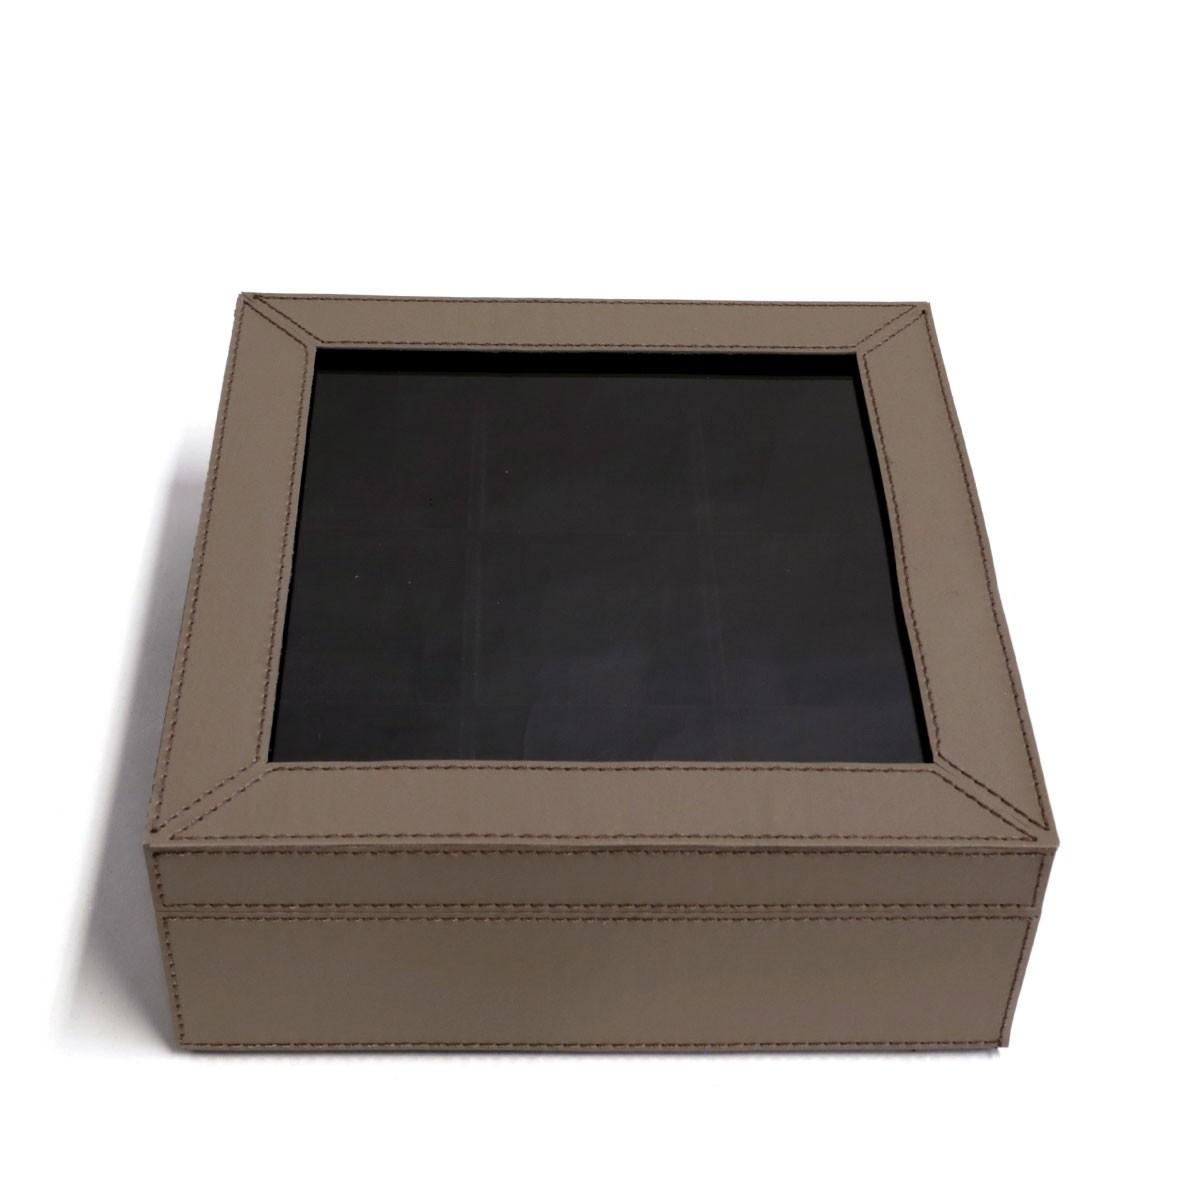 Caixa porta relógios (Montana Fendi)